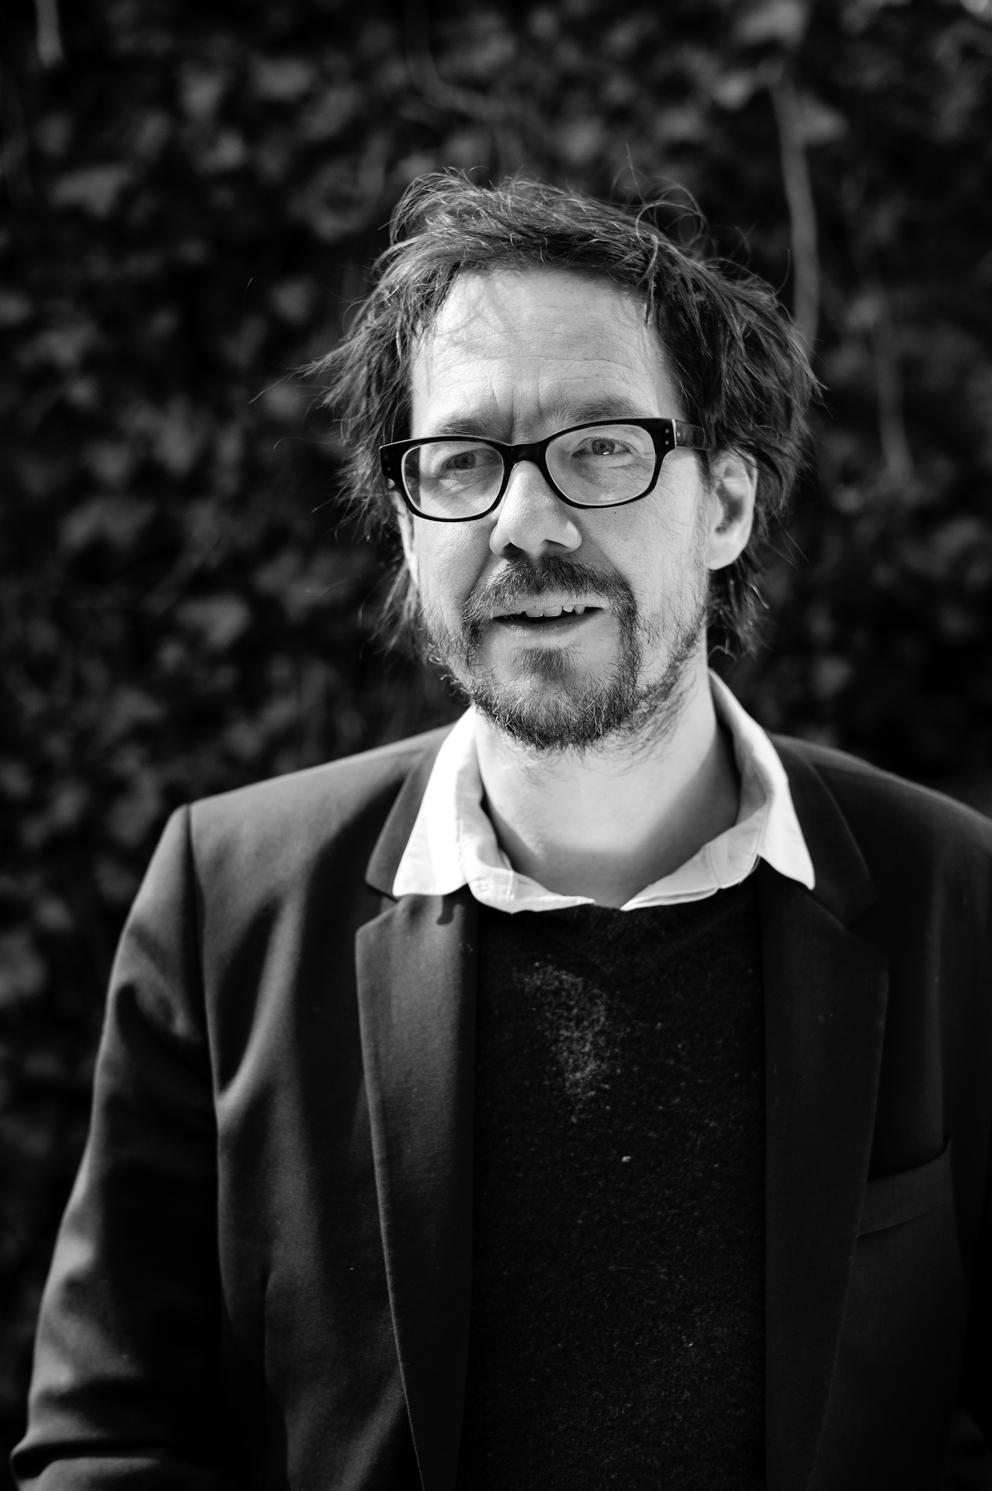 Mark Manders, foto di Cedric Verhelst